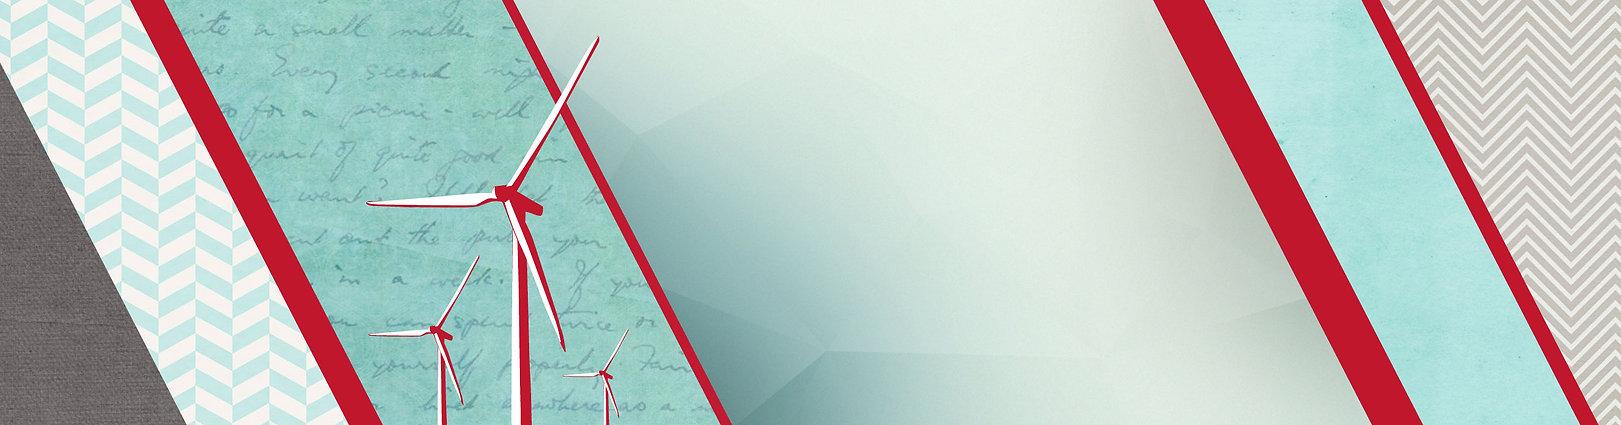 facebook-cover-wix-strip6.jpg